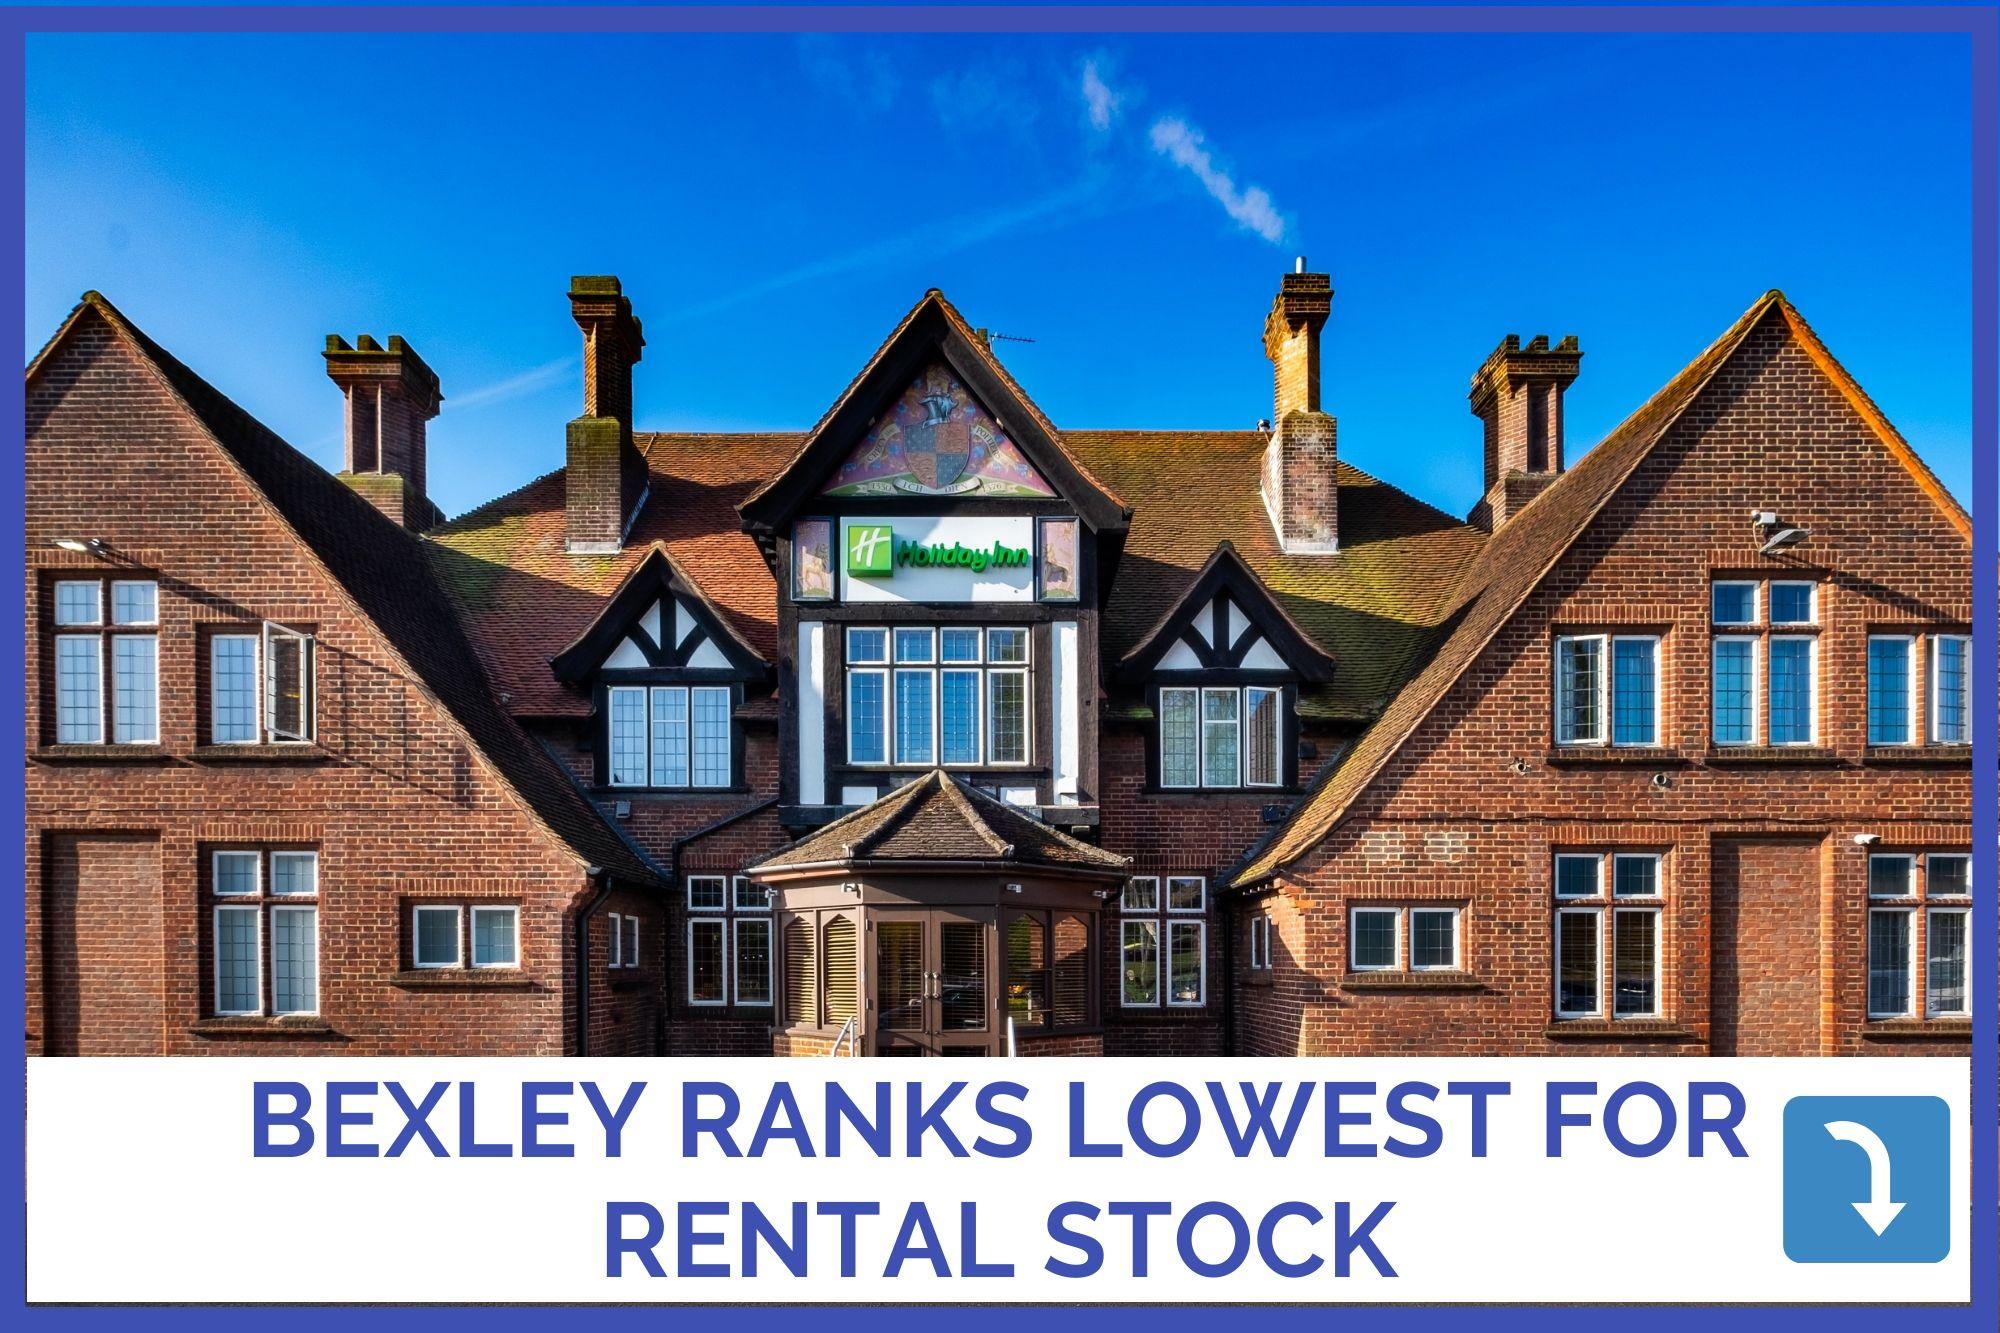 BEXLEY RANKS LOWEST FOR RENTAL STOCK